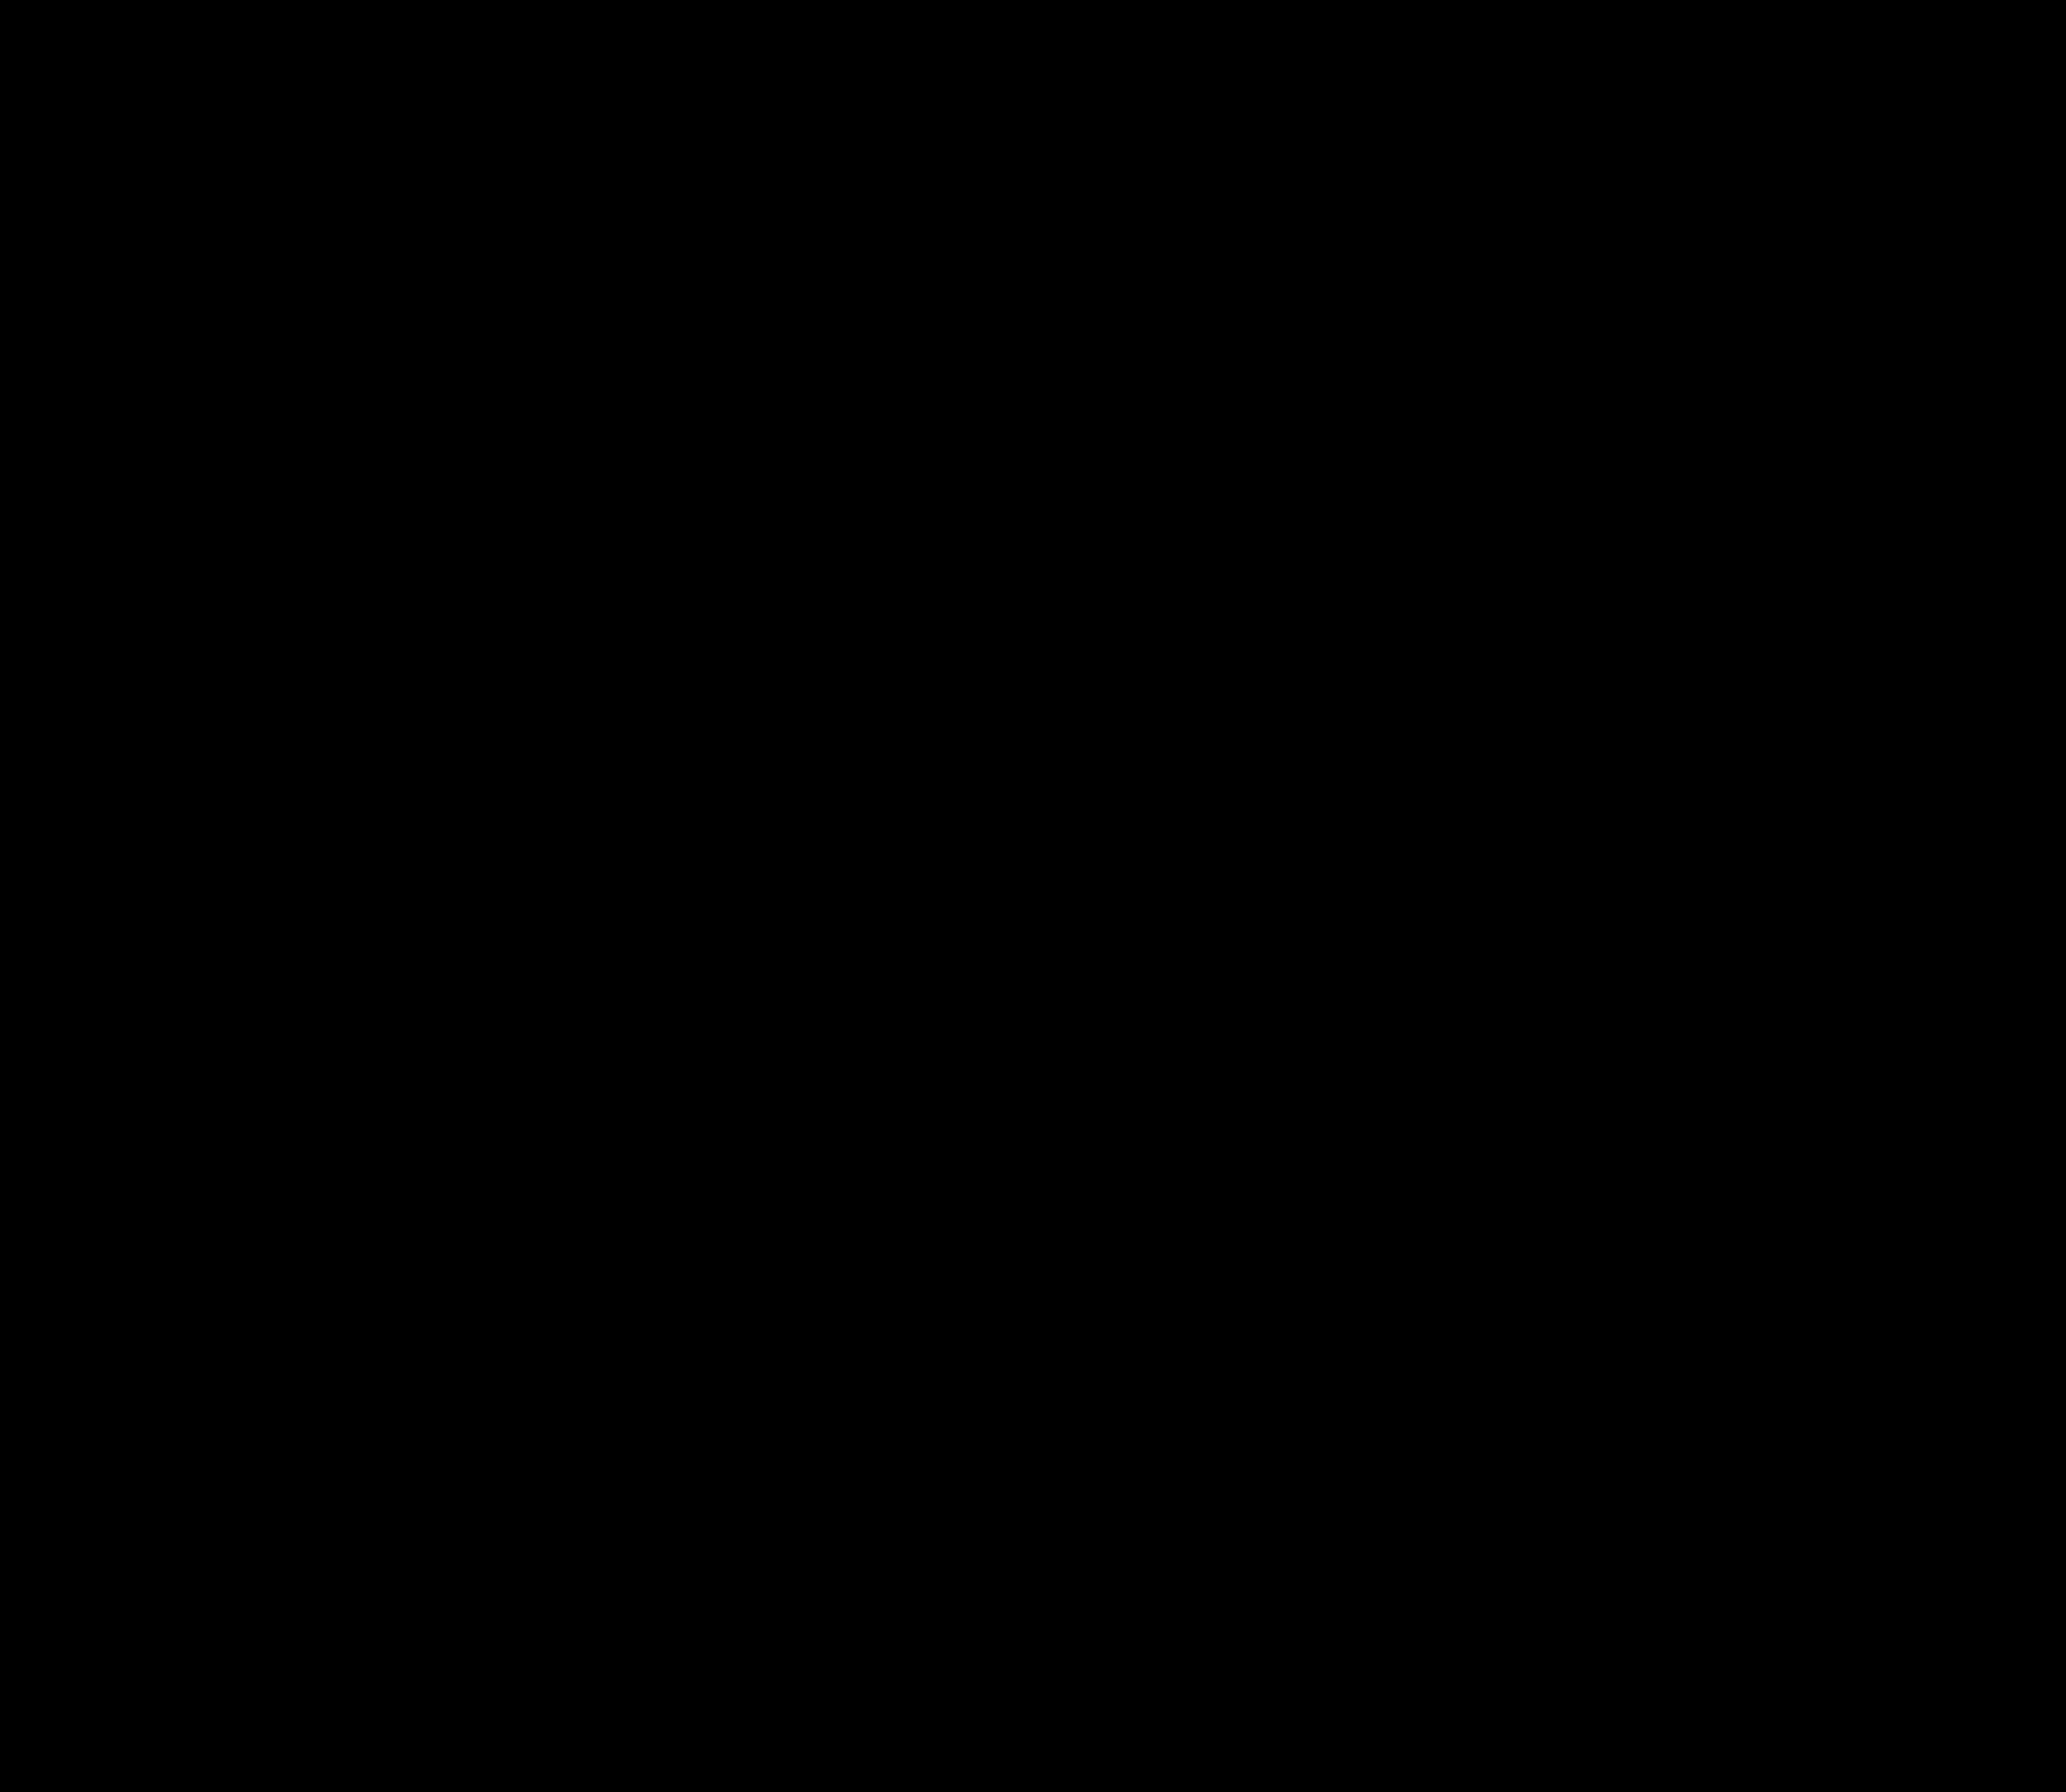 Clipart Horse scheme